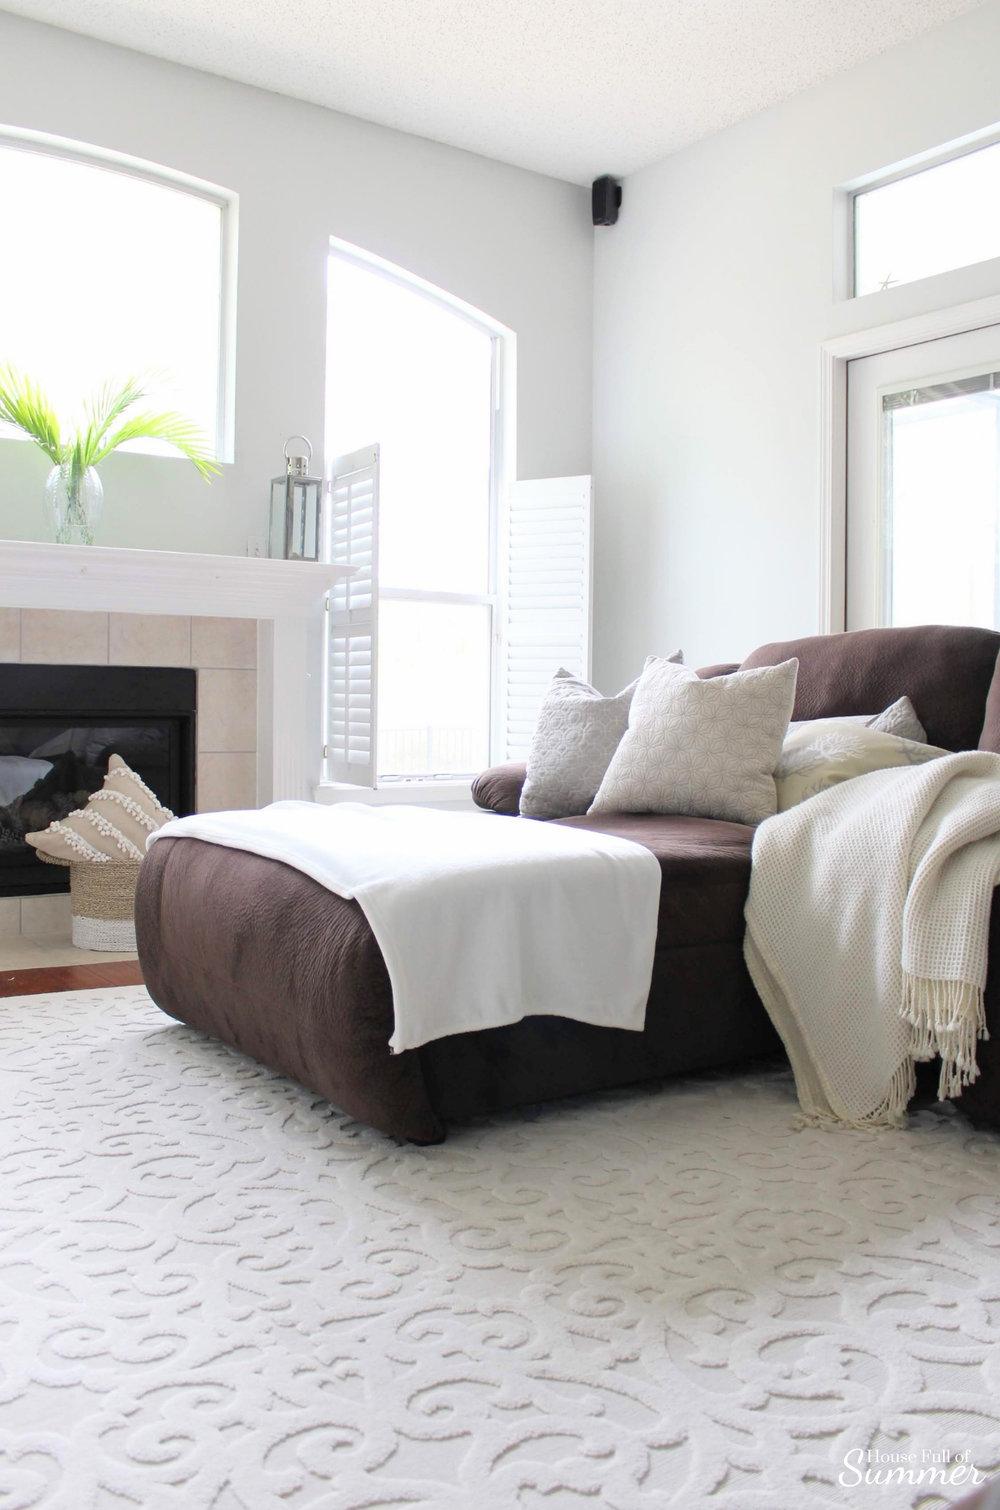 How I Chose My Calming Coastal Gray Wall Color | Tips for Choosing Interior Paint Colors #housefullofsummer #coastaldecor  @housefullofsummer #paintcolor #graypaint #greypaint #coastalpaintcolors #coastalhome #beachhouse